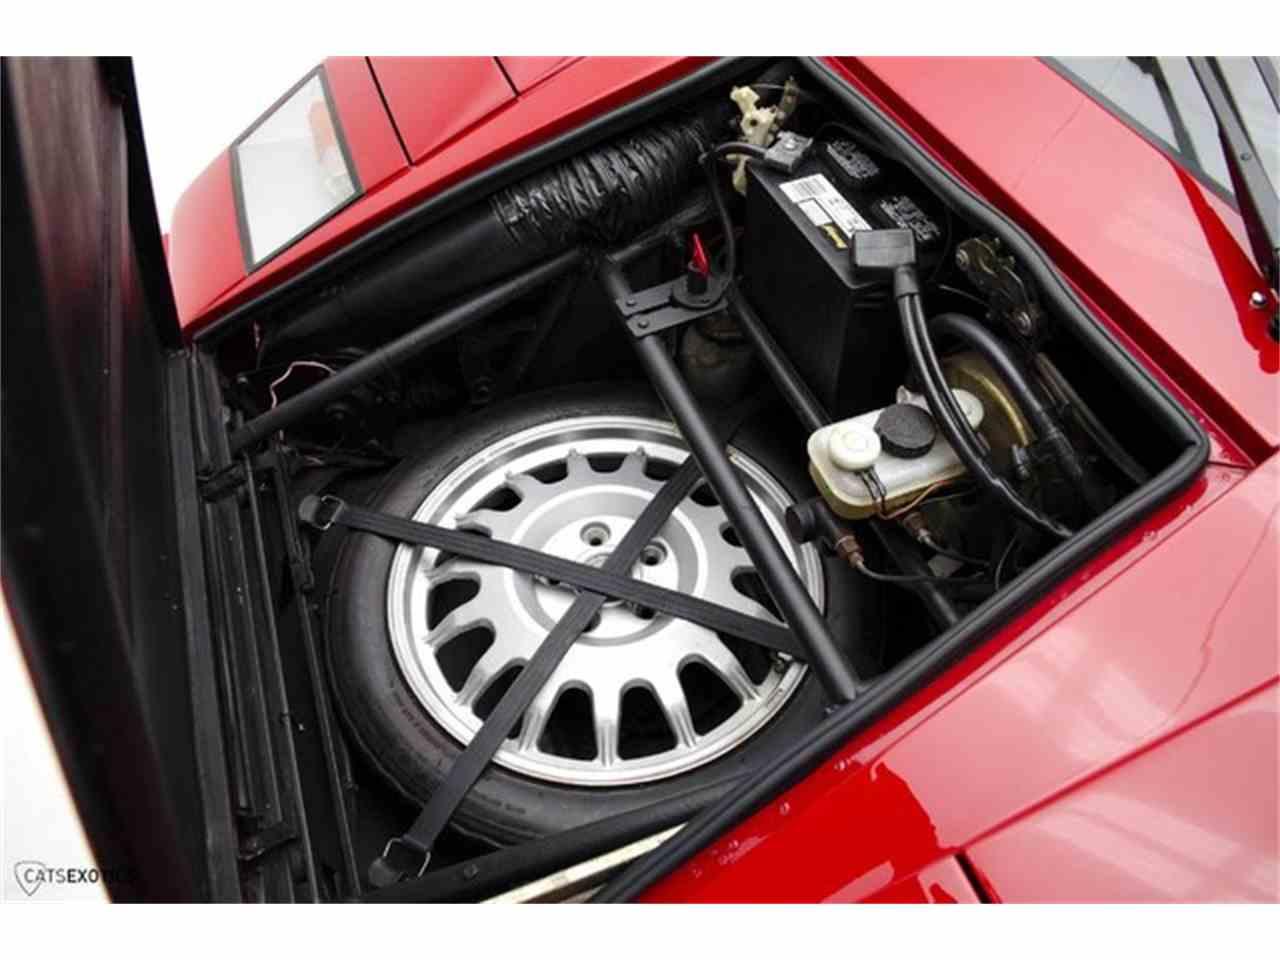 1983 Lamborghini Countach For Sale Classiccars Com Cc 721662